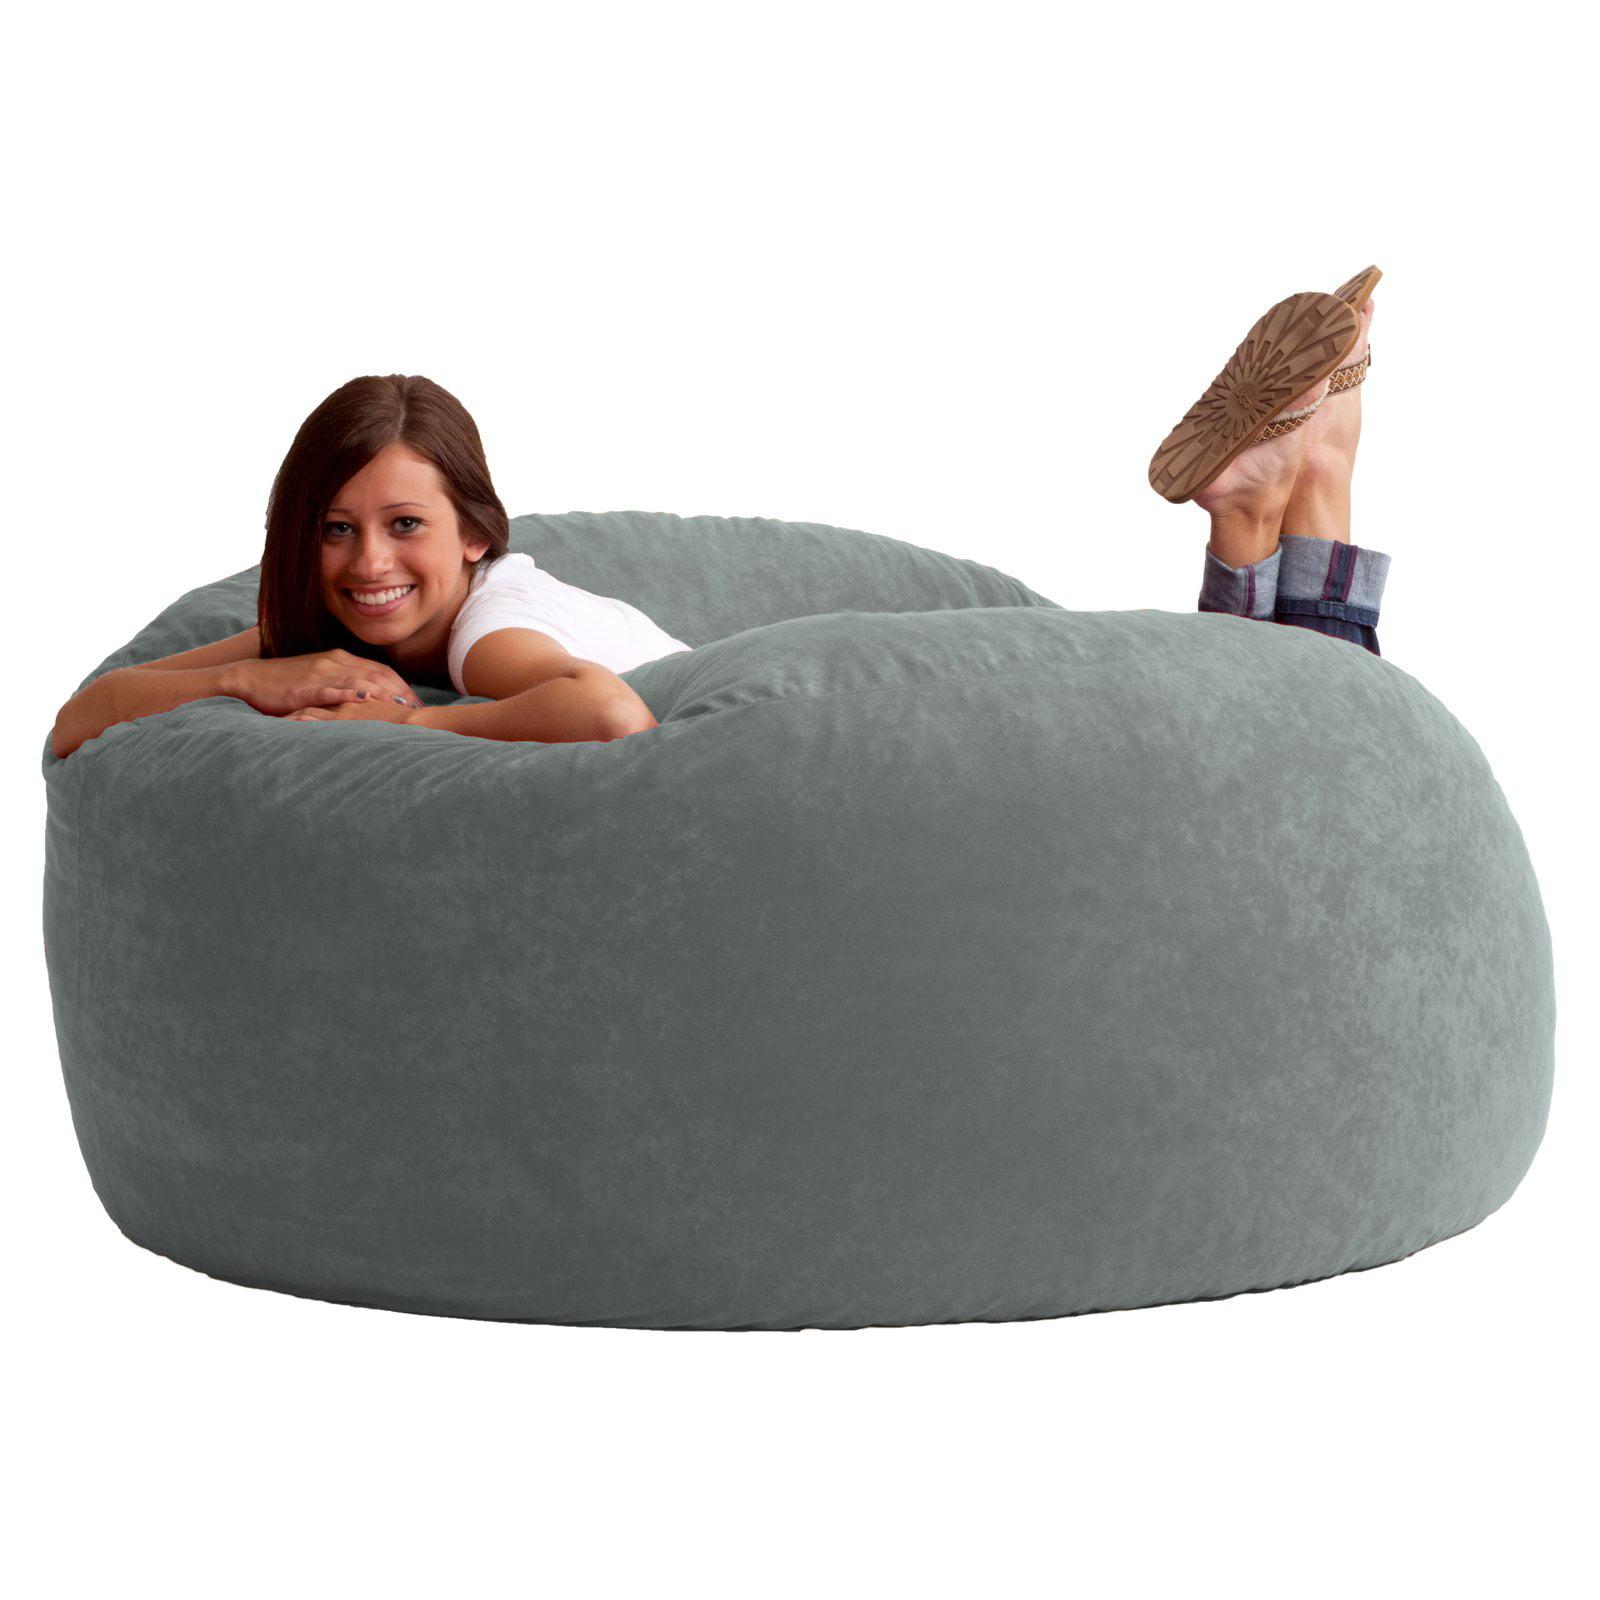 Tremendous Big Joe King 5 Fuf Bean Bag Chair Multiple Colors Fabrics Ncnpc Chair Design For Home Ncnpcorg